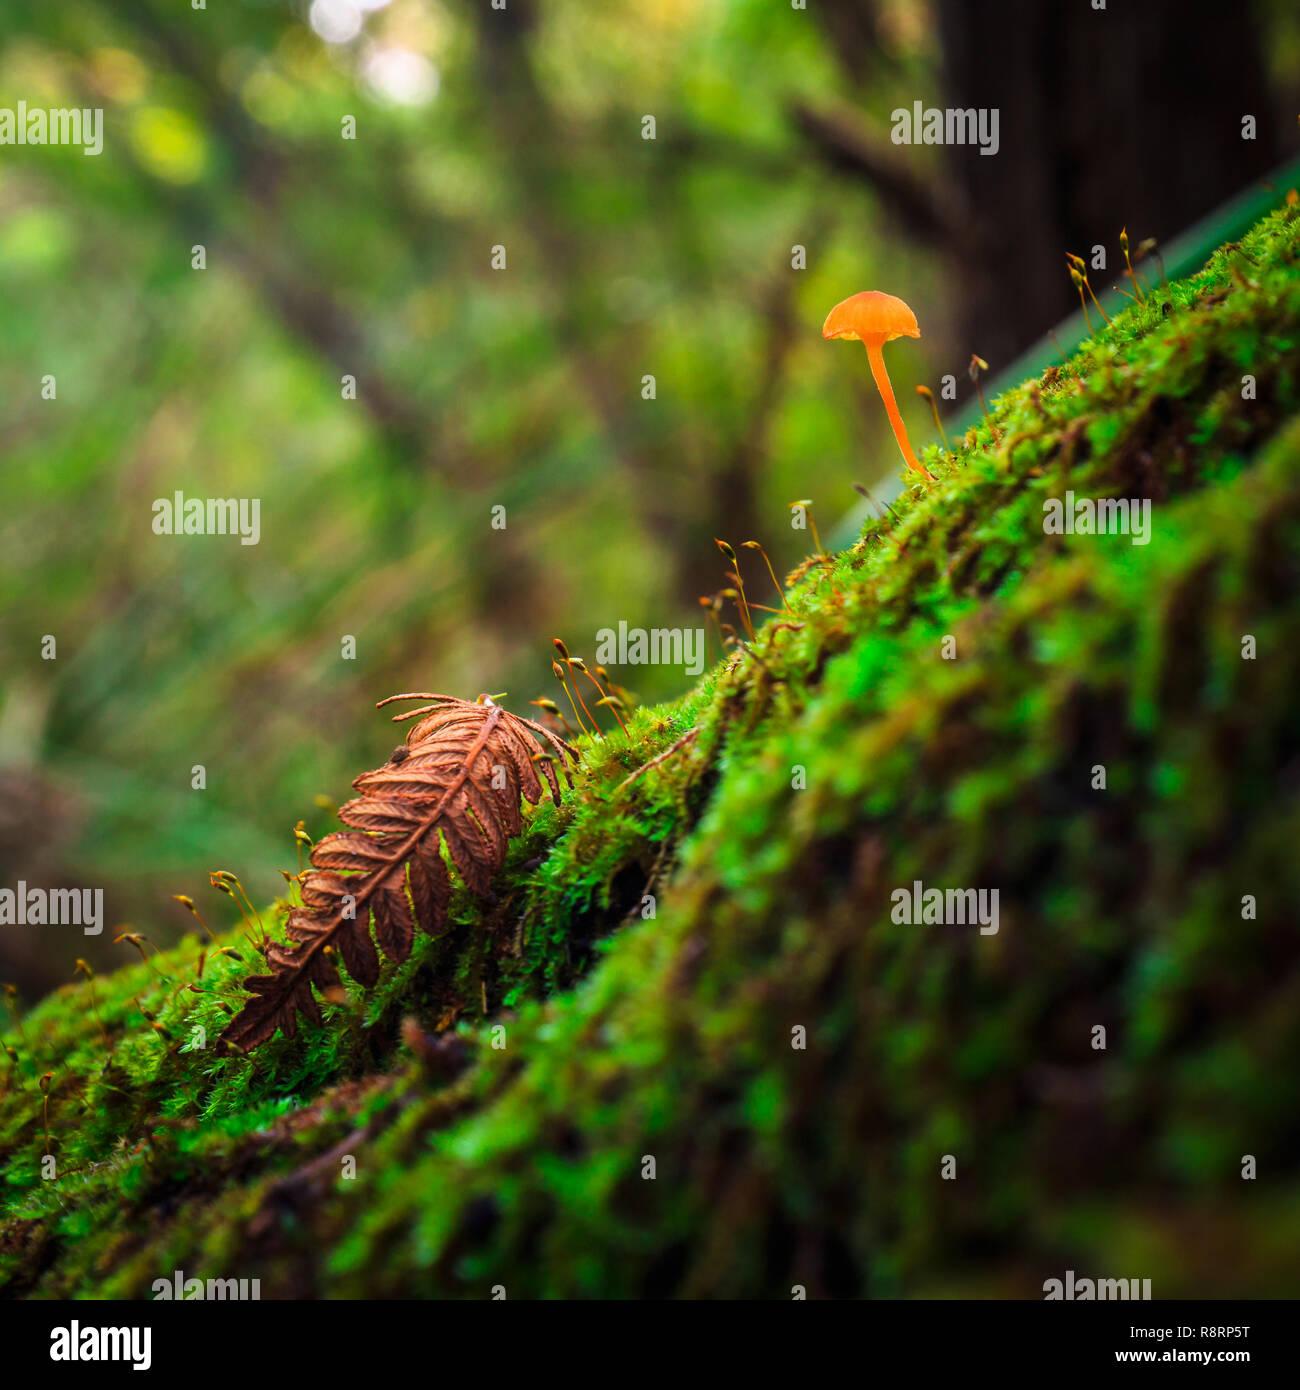 Bosque de setas Imagen De Stock